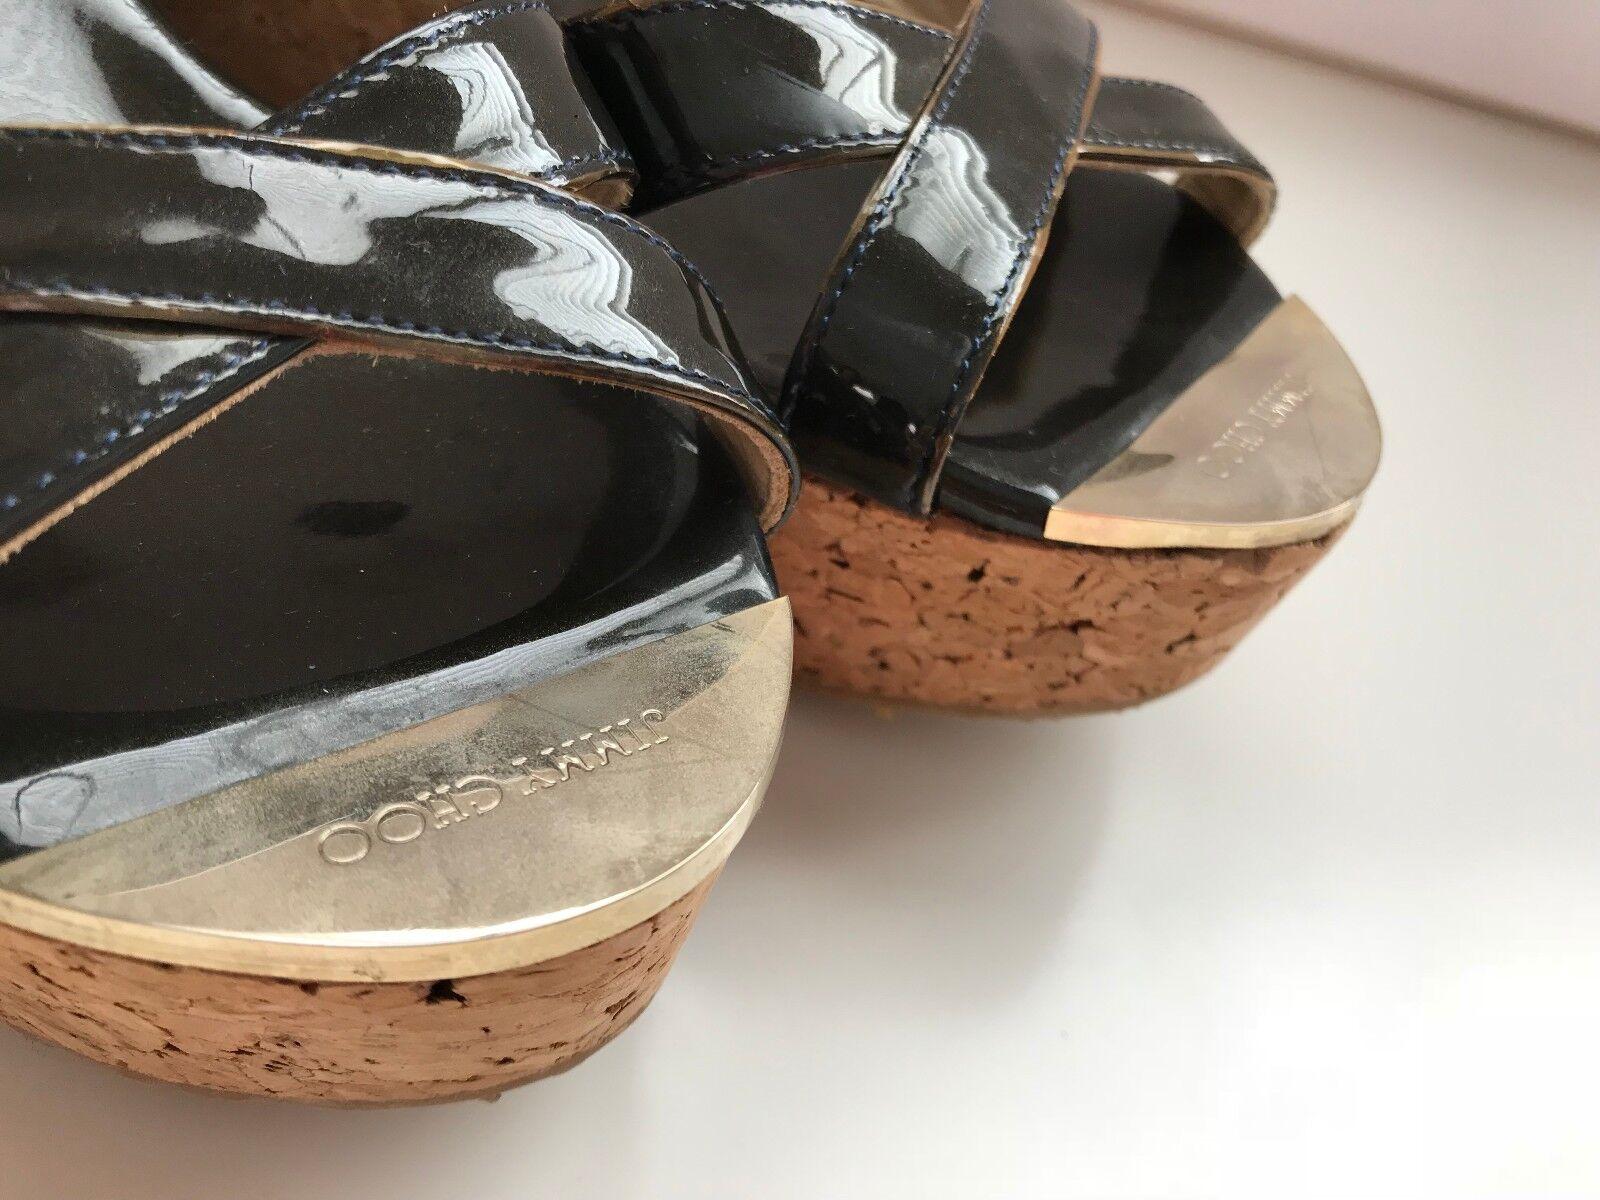 JIMMY CHOO nero Patent LEATHER WEDGE Platform SANDALS SANDALS SANDALS 35 Crisscross Heel scarpe 923192